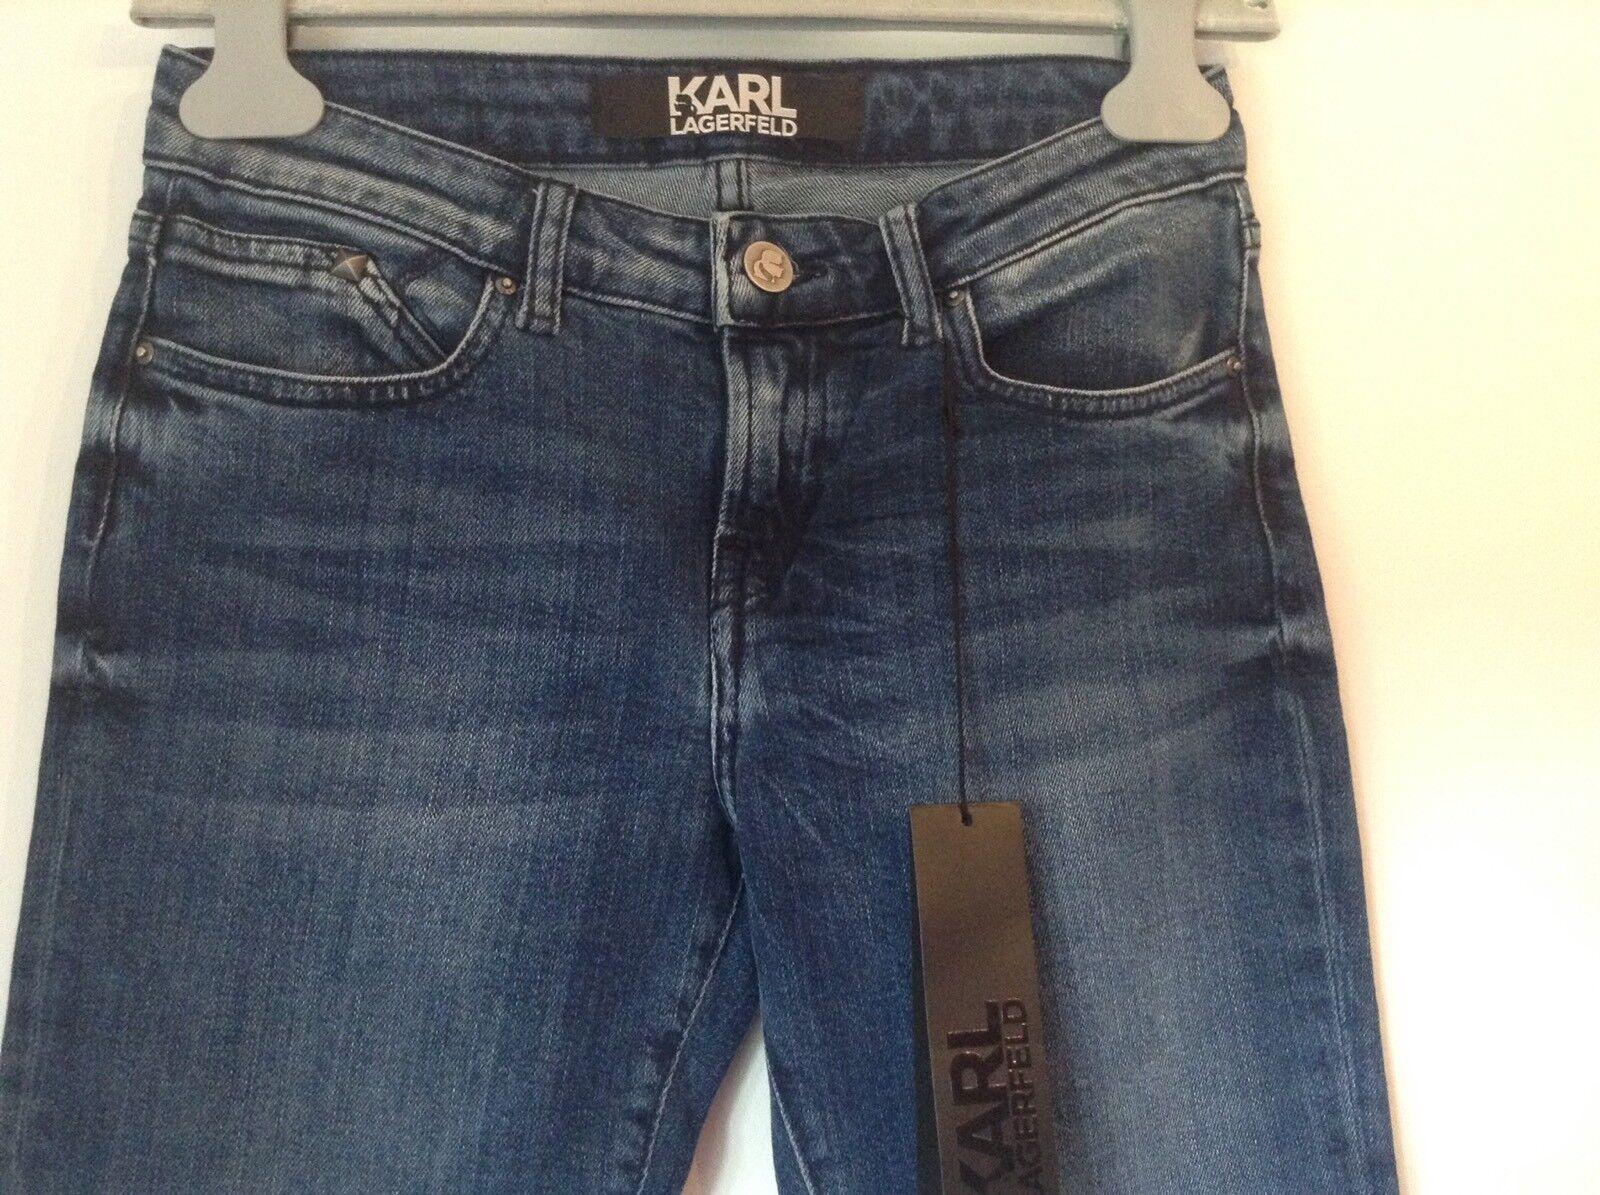 BNWT 100% auth Karl Lagerfeld Slim Fit   Skinny Amazing Jeans. 25 RRP